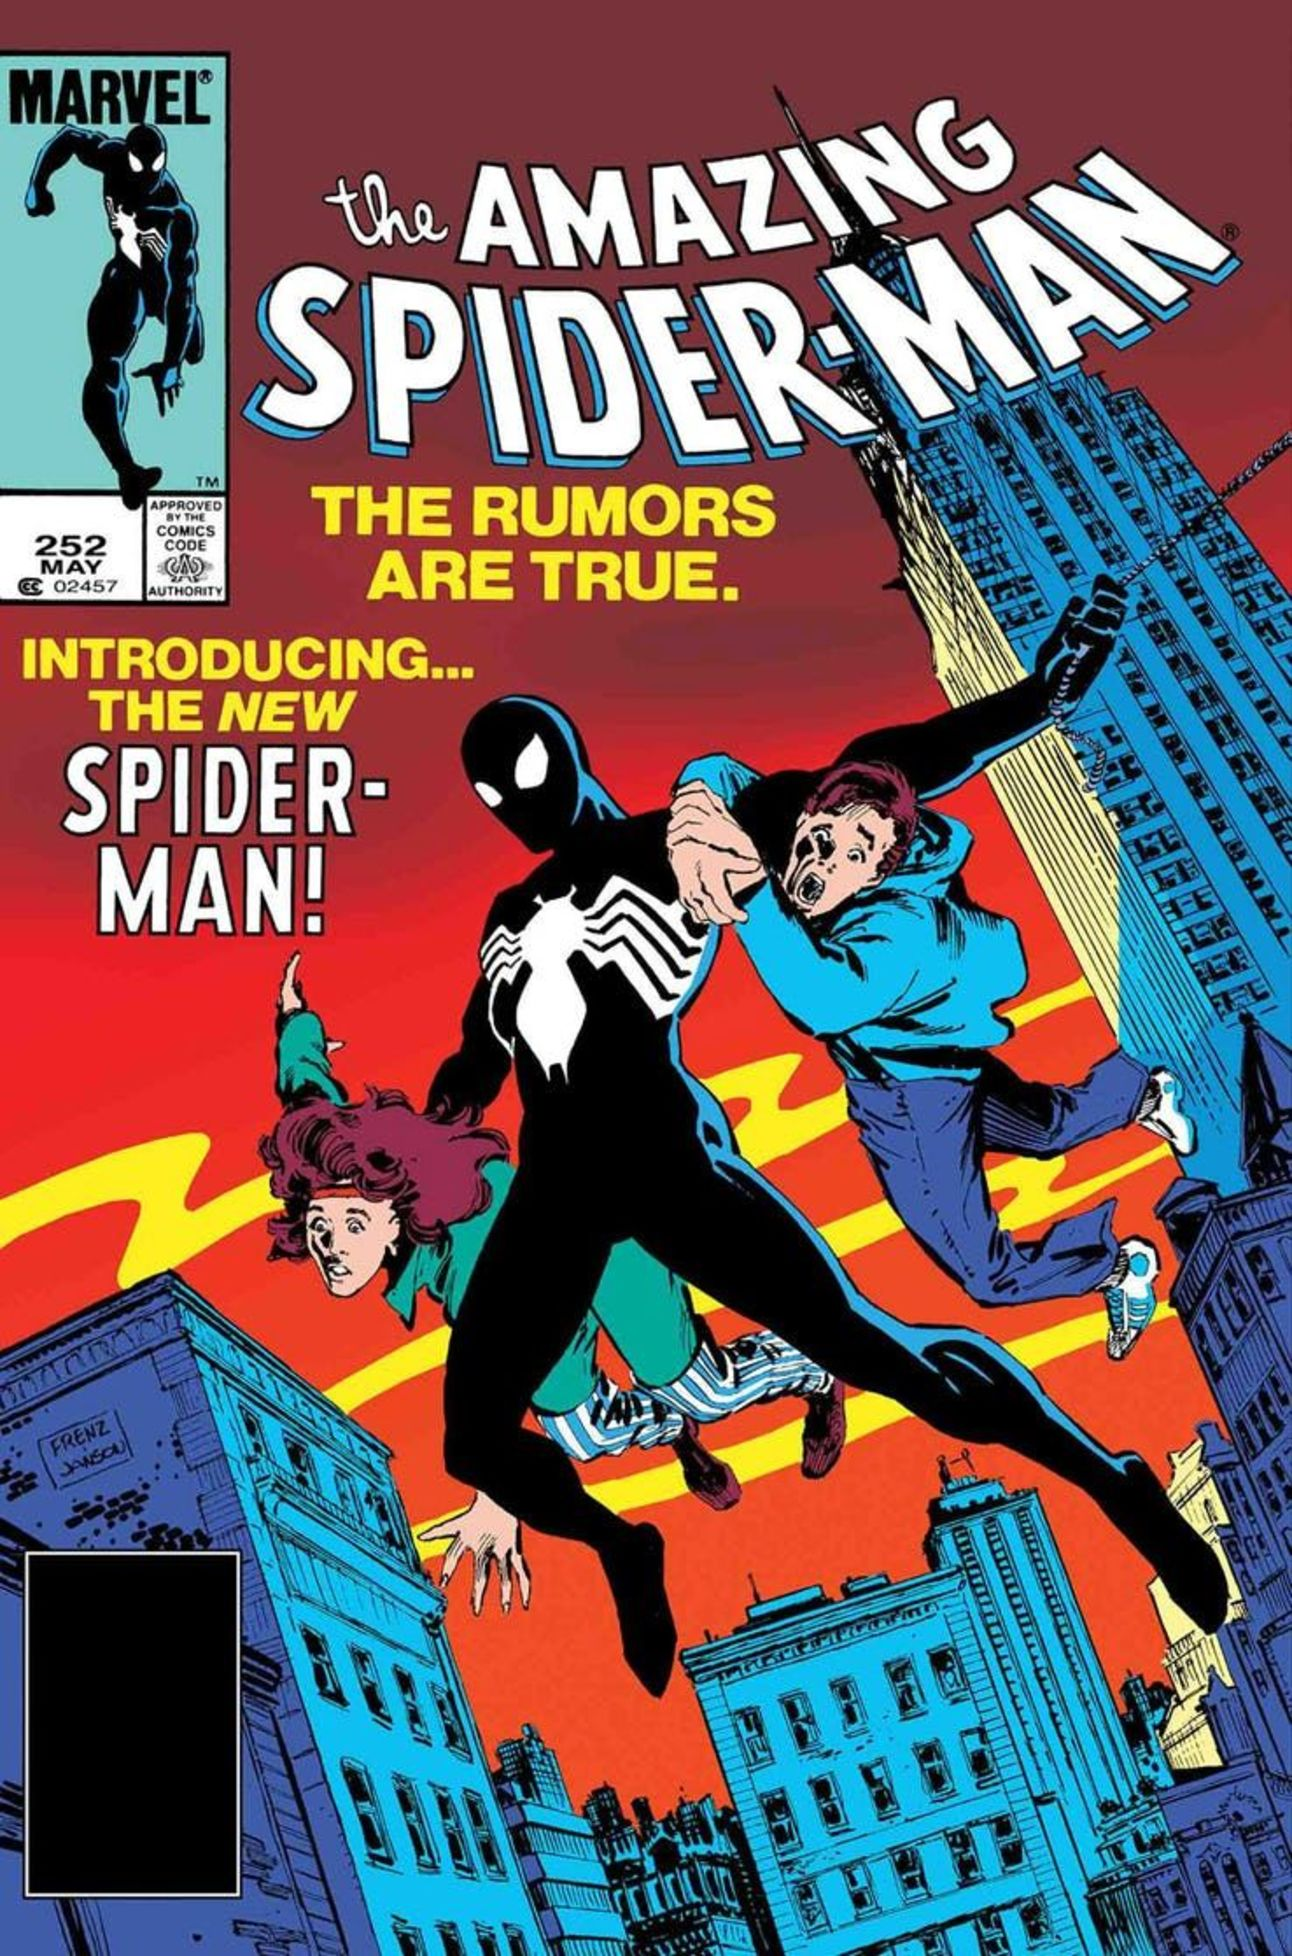 Marvel April 2019 29